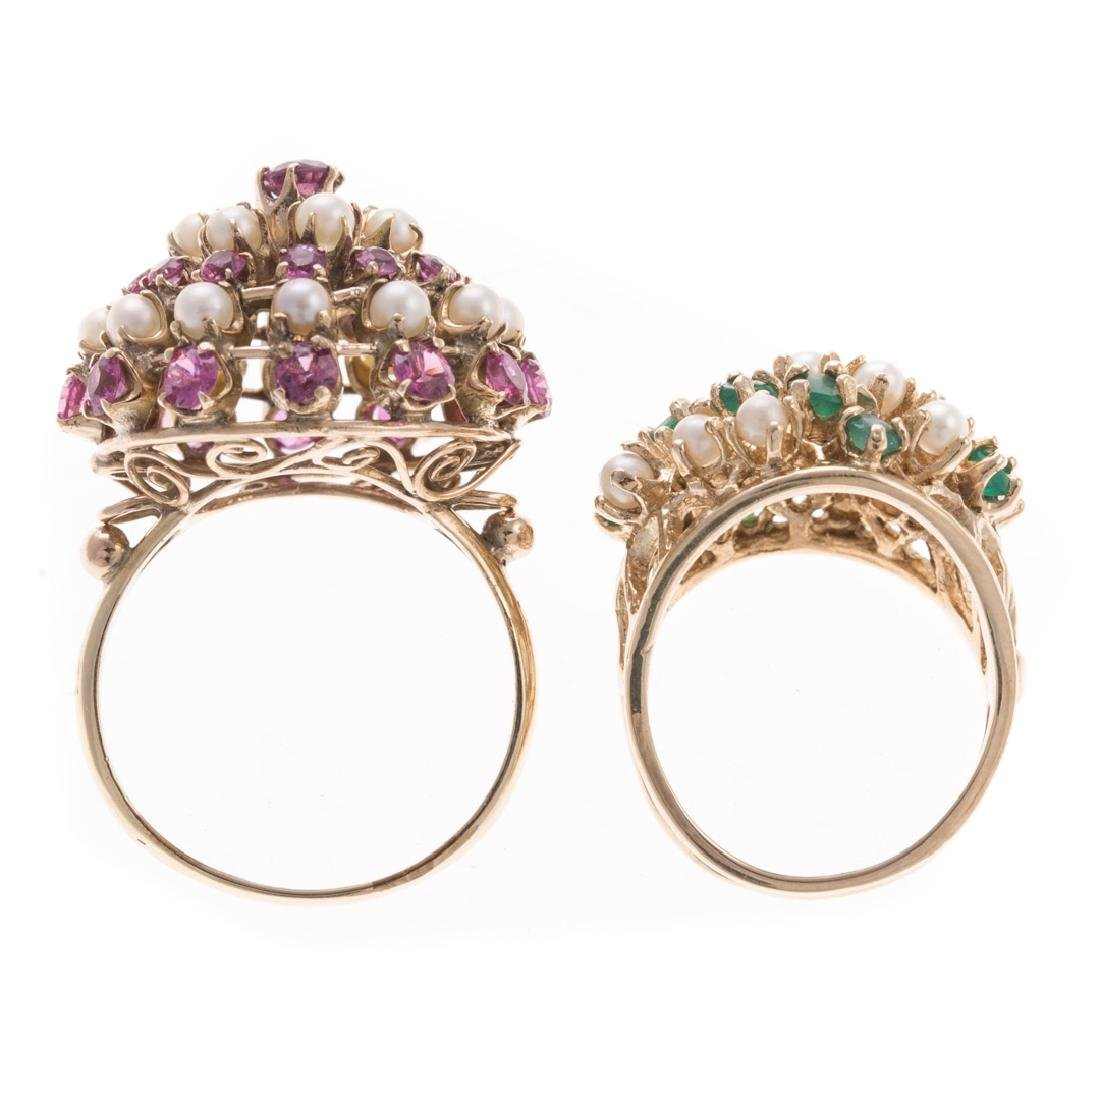 A Pair of Lady's Pearl & Gemstone Cluster Rings - 5